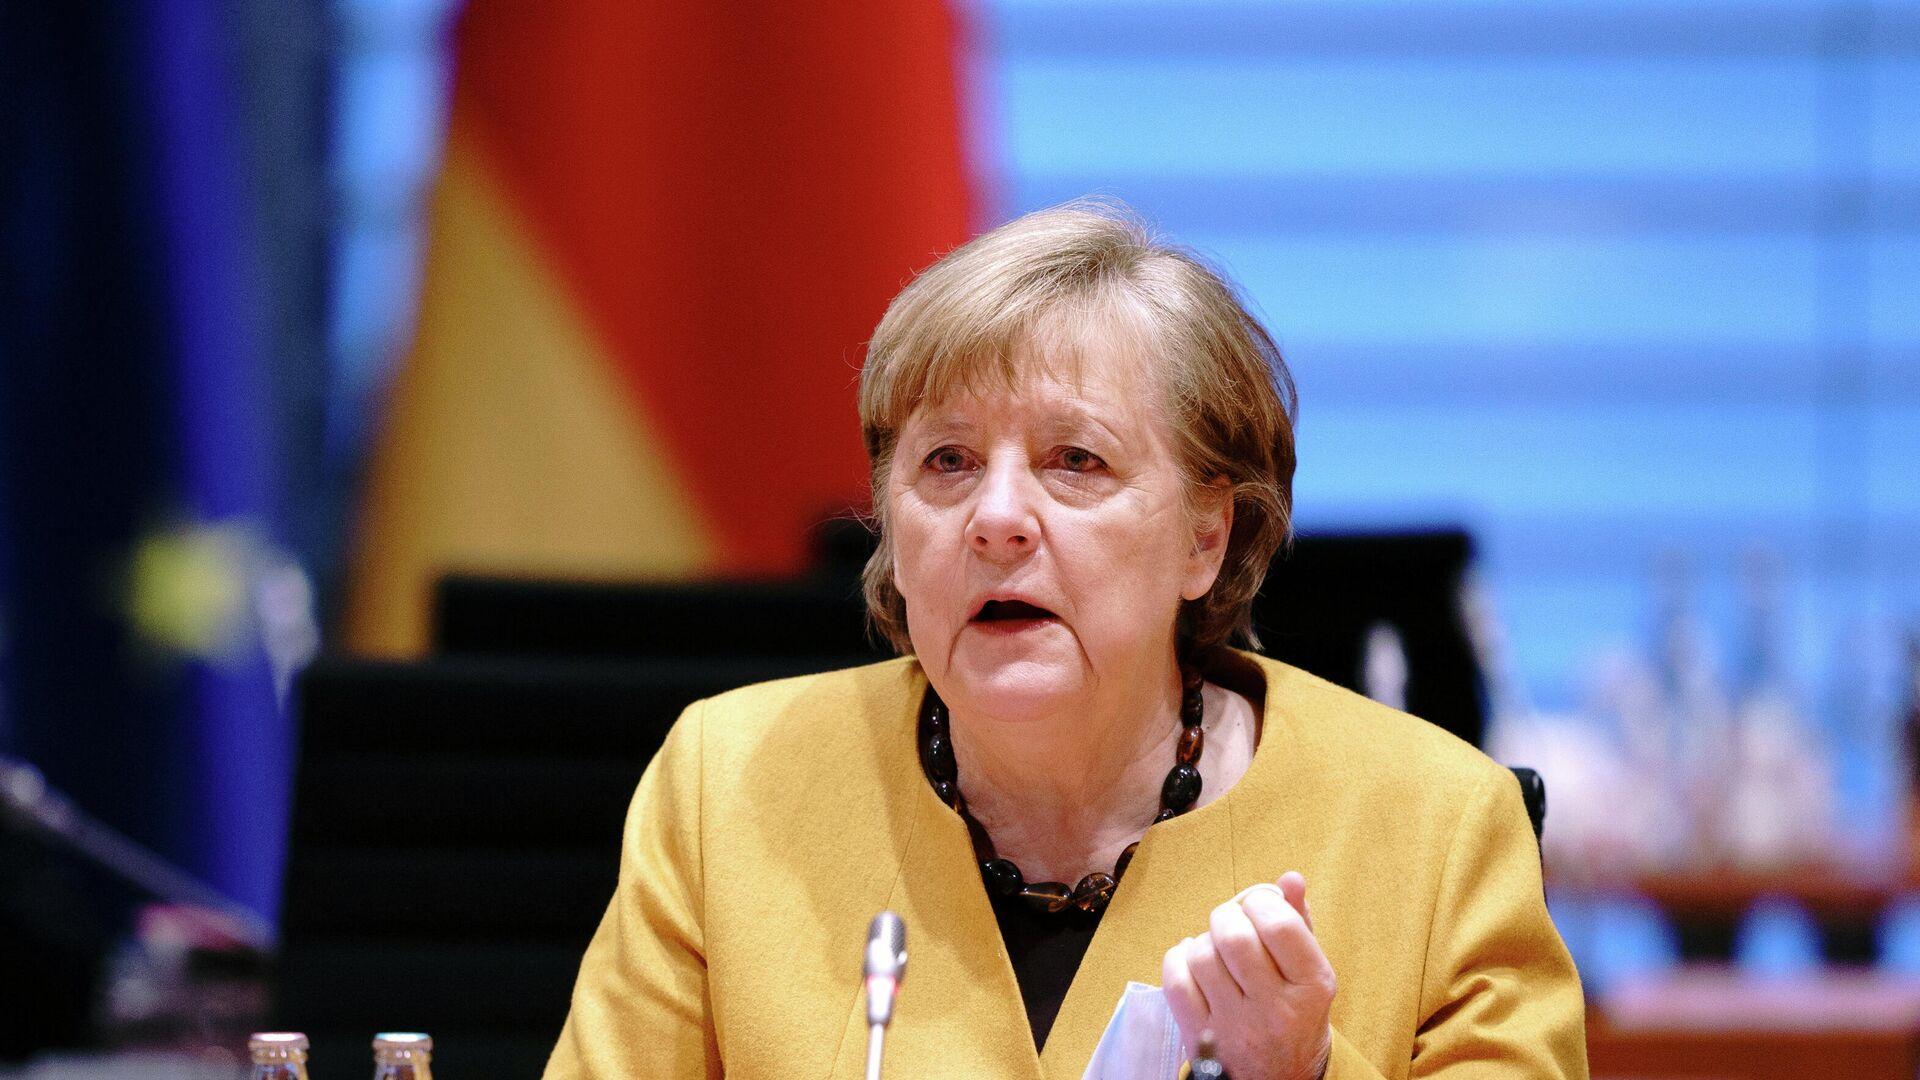 Angela Merkel, canciller alemana - Sputnik Mundo, 1920, 24.03.2021